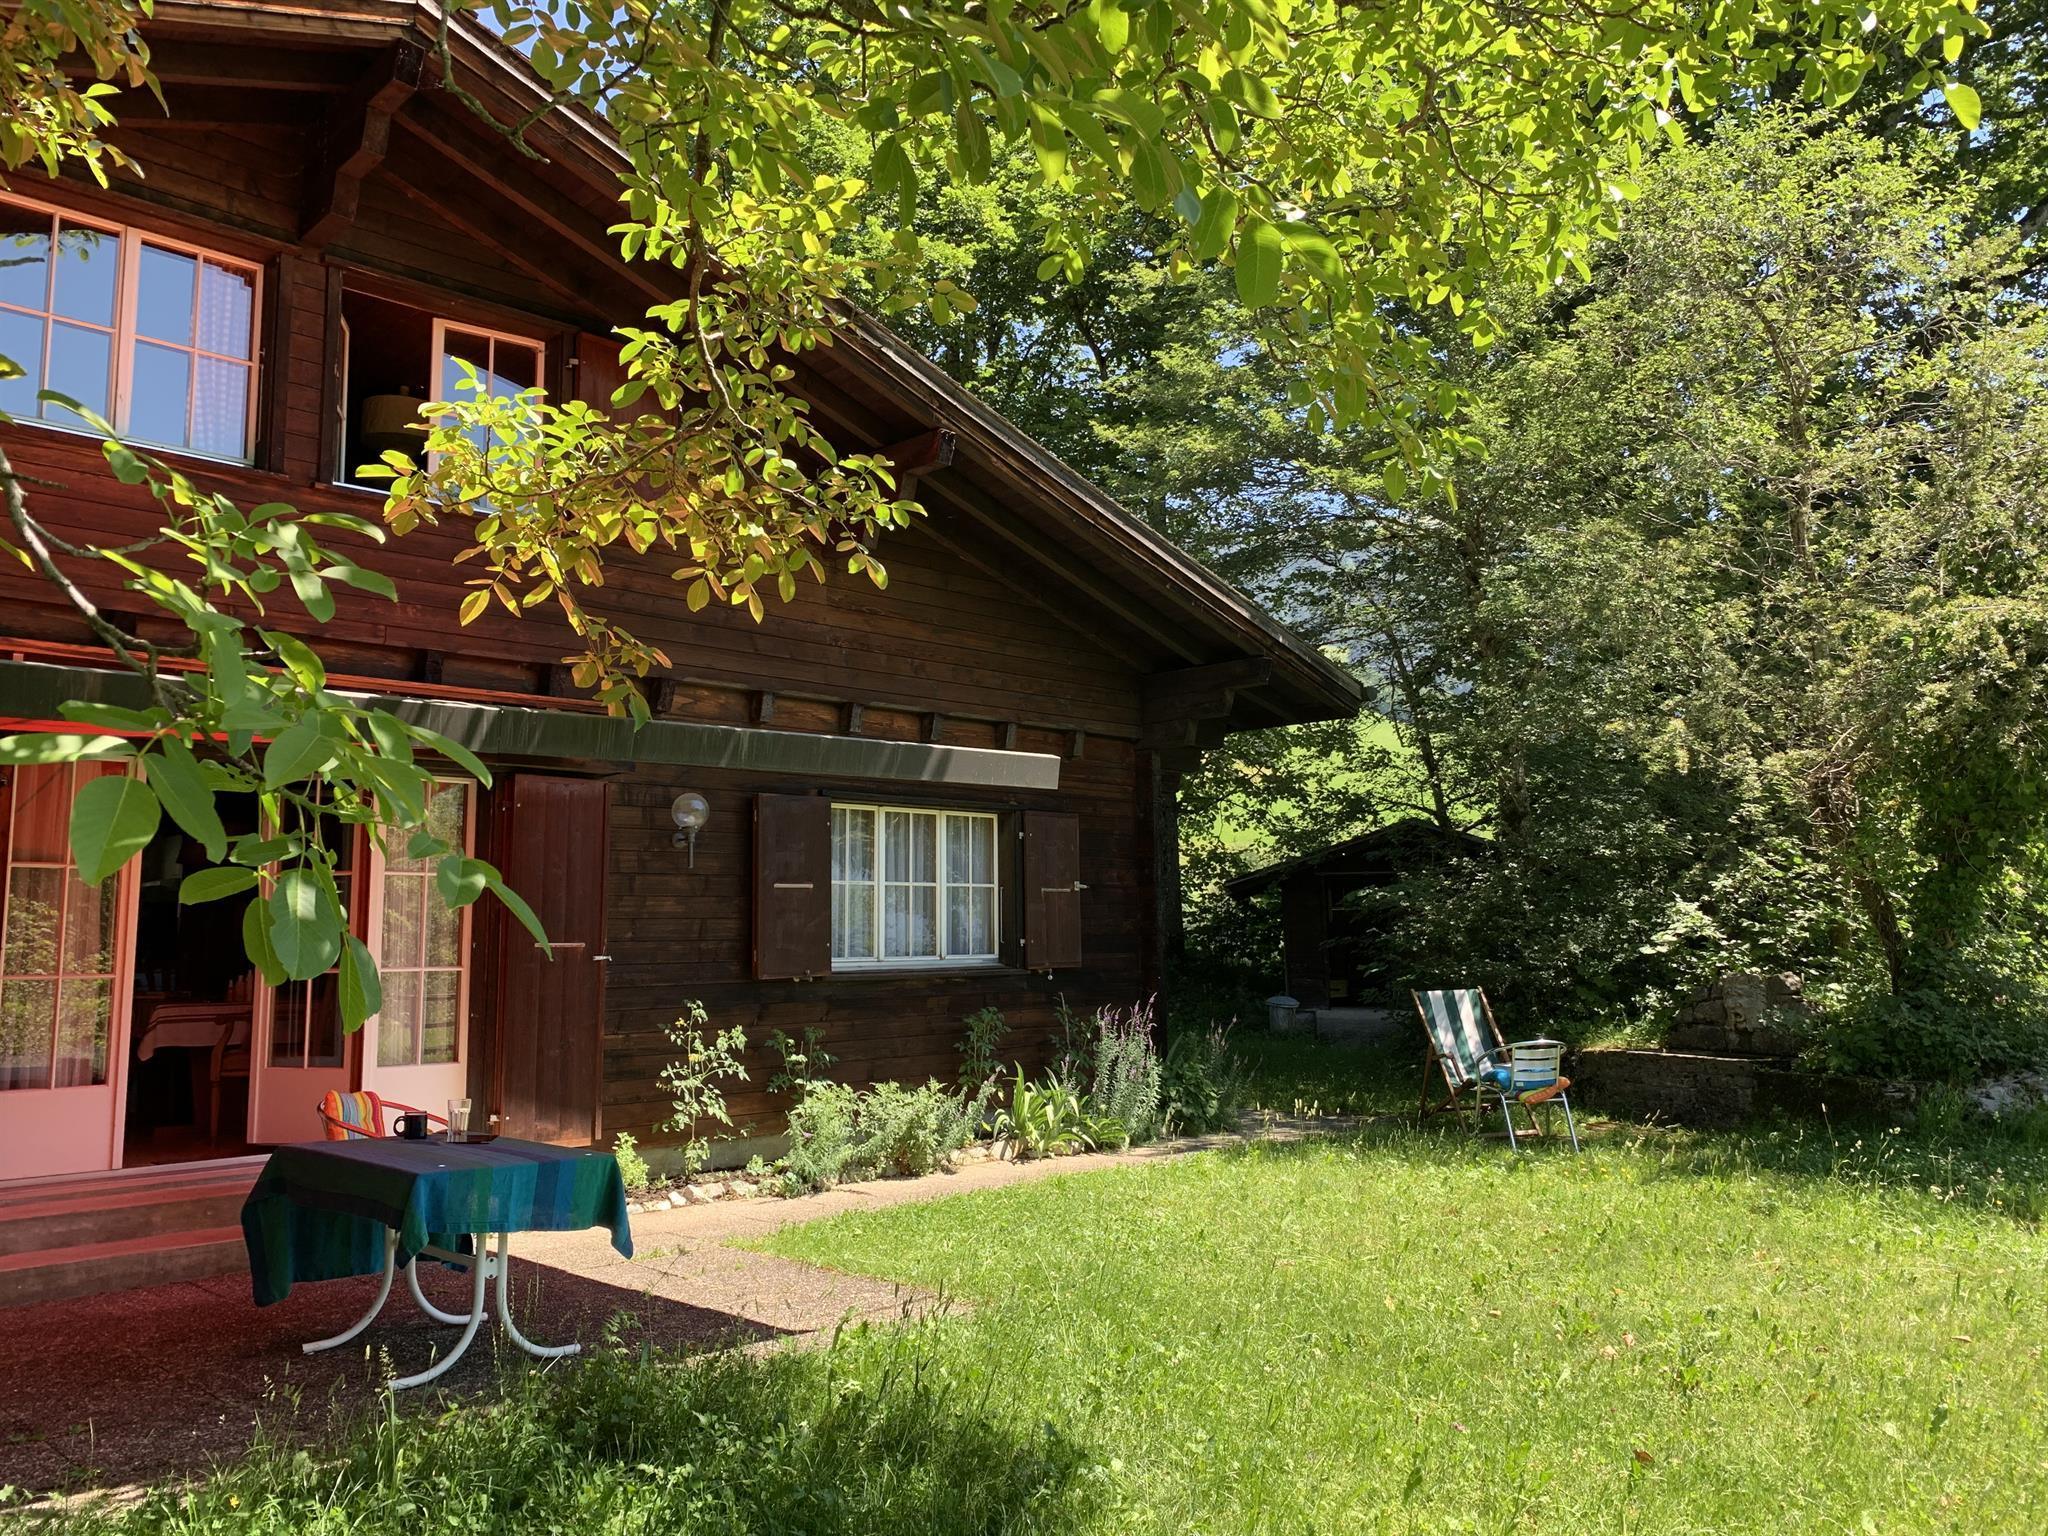 Ferienhaus Roth Flüehli Hasliberg Goldern 5 Bettwohnung